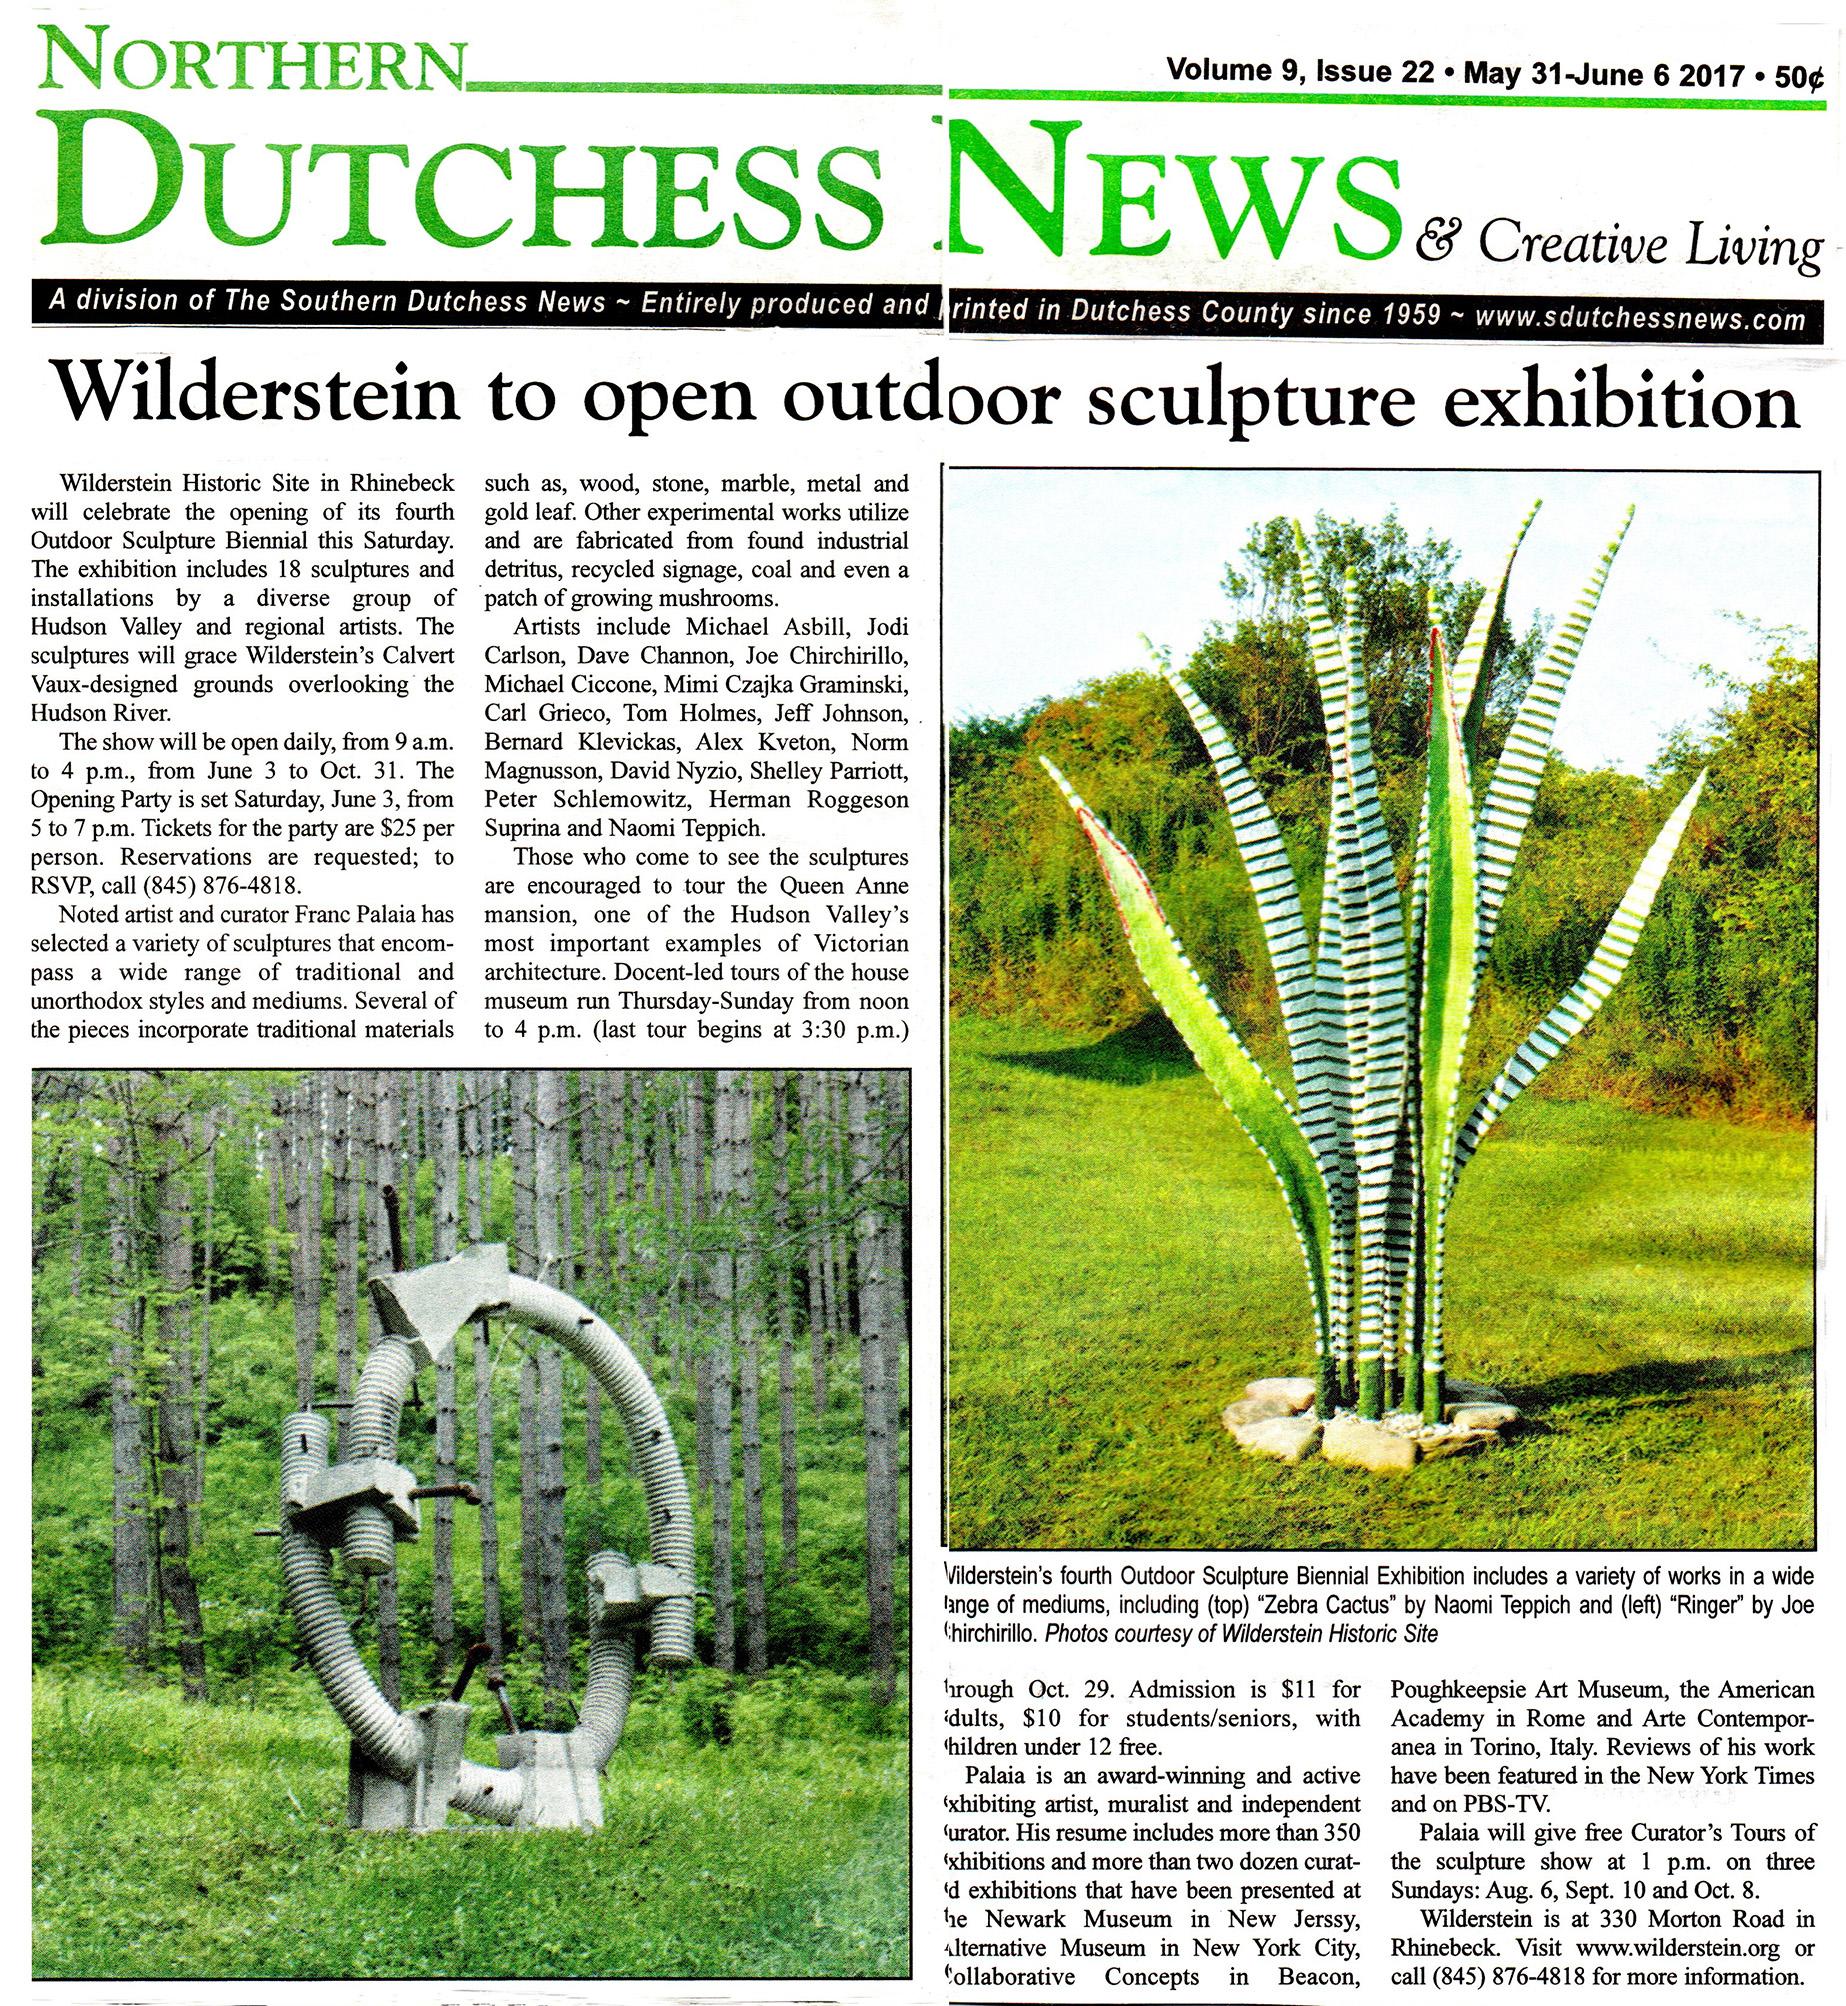 Northern Dutchess News copy2.jpg